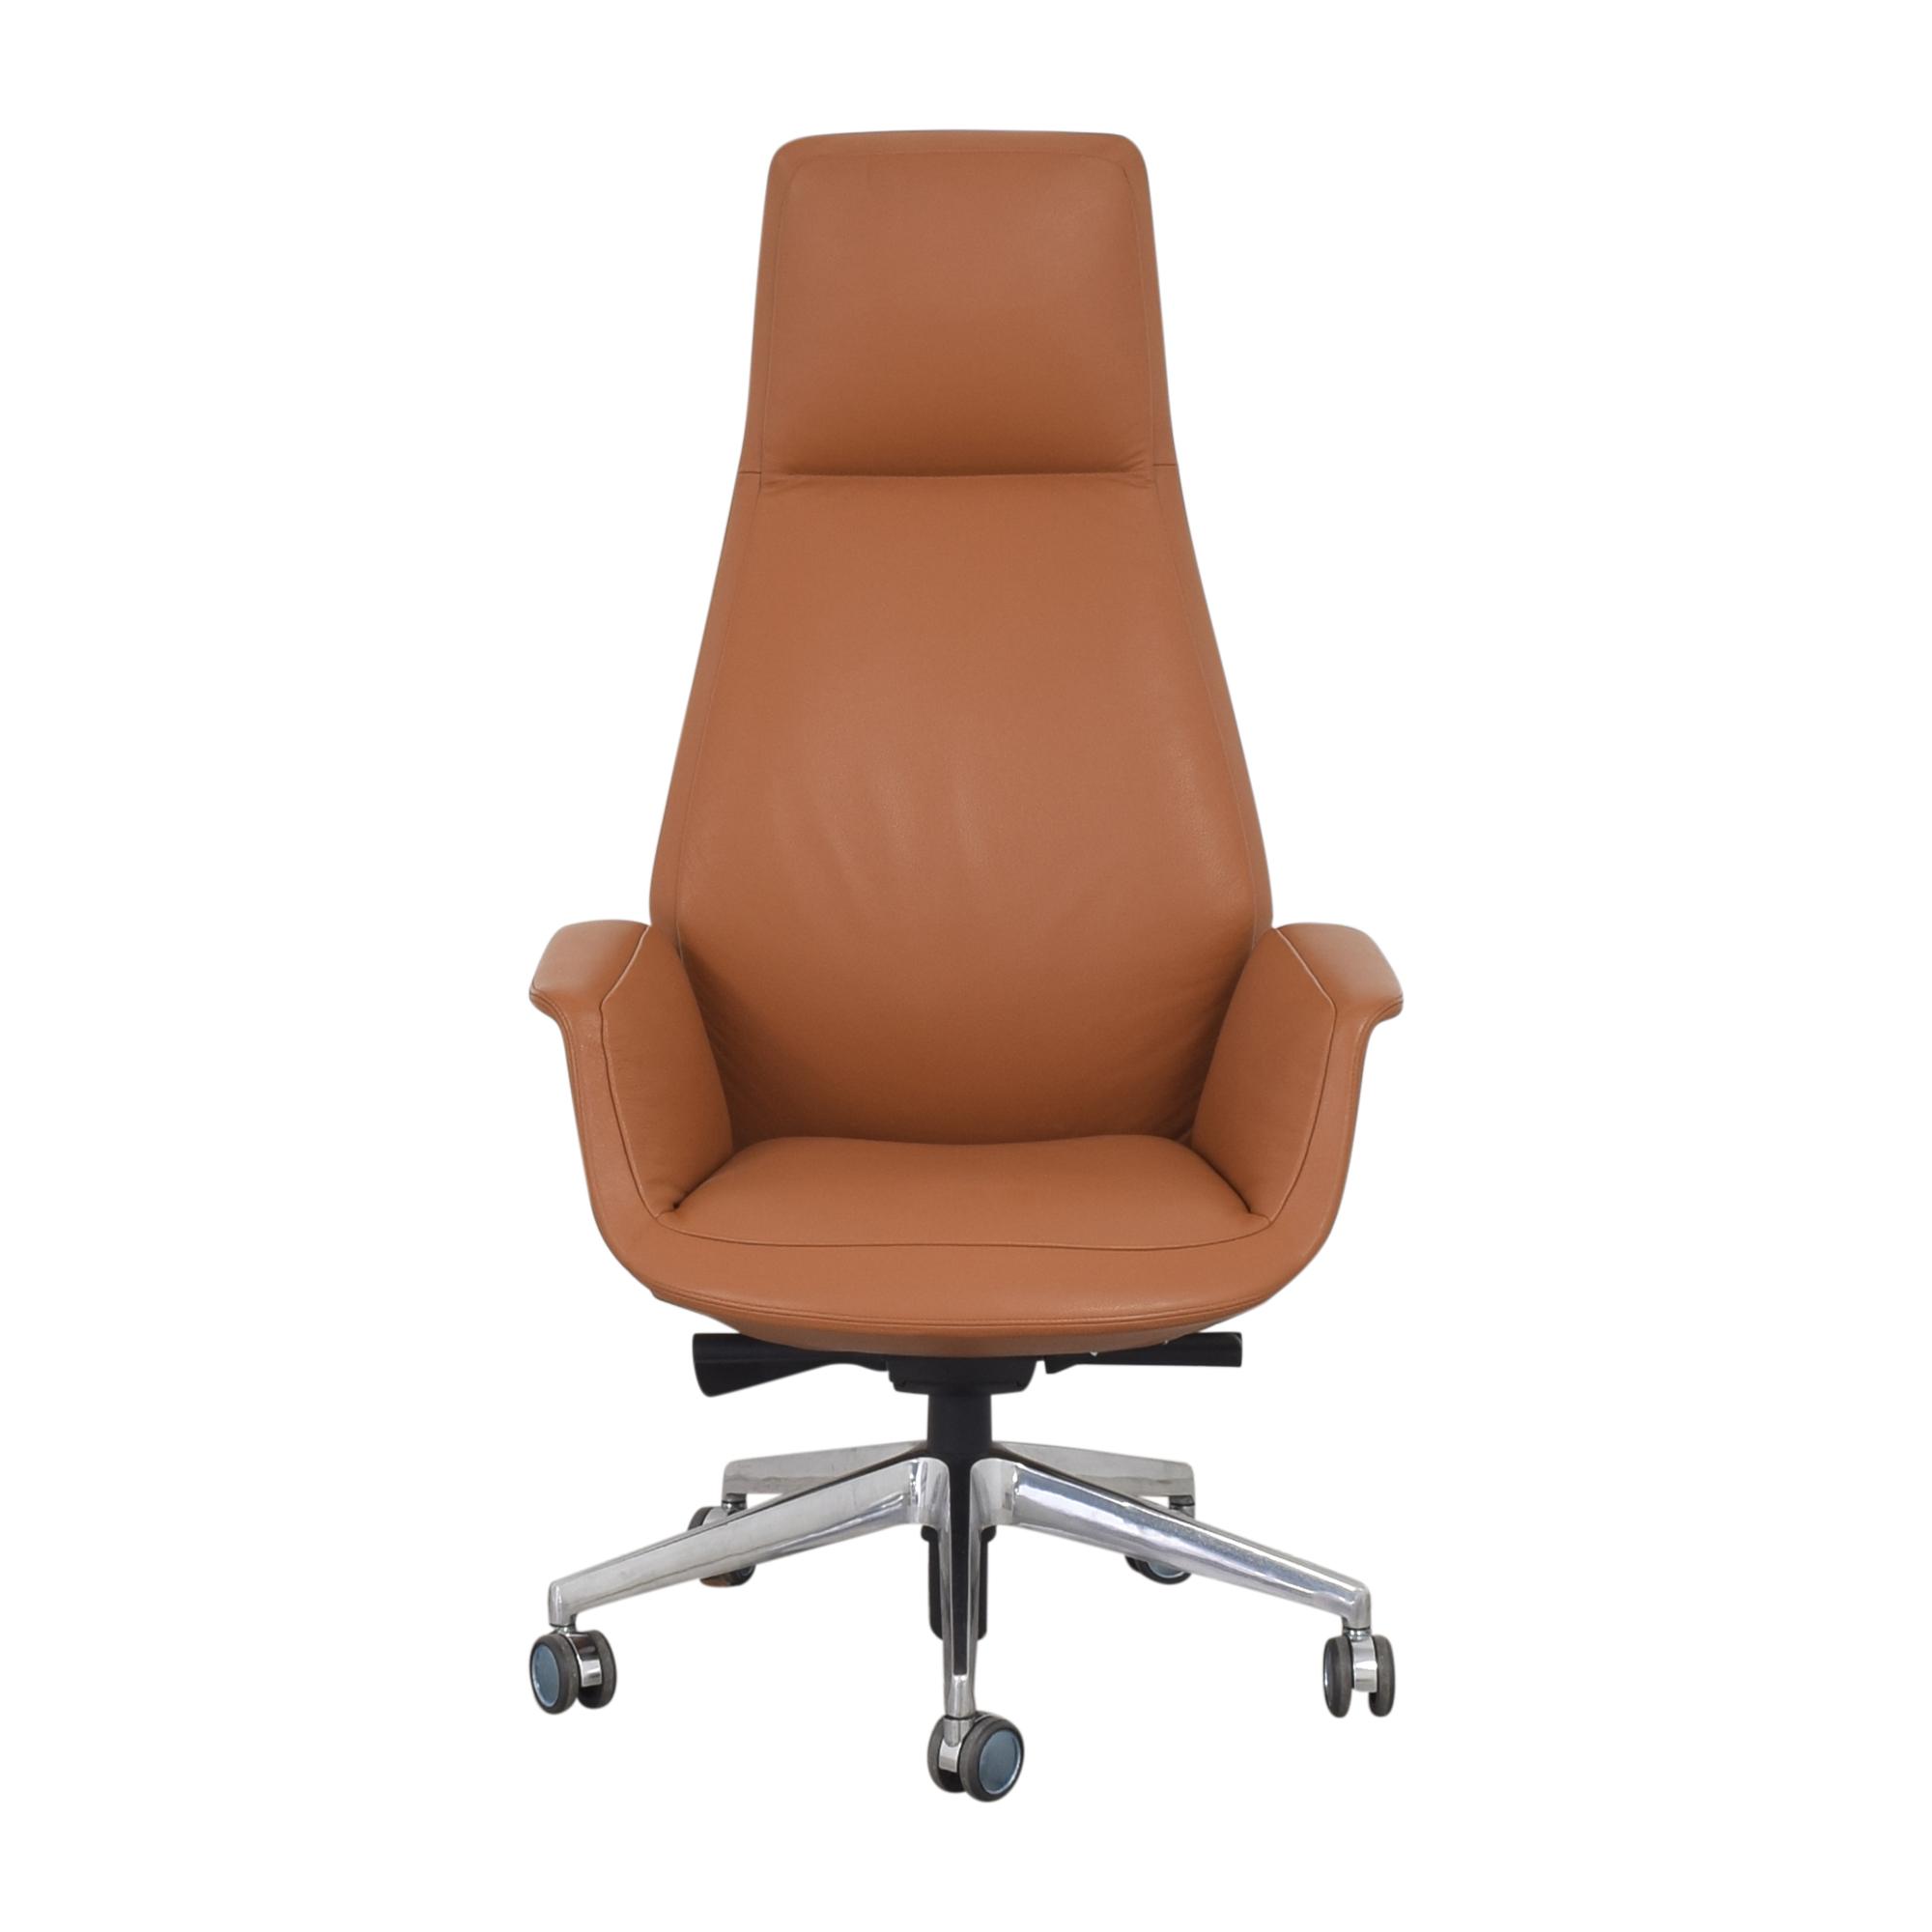 shop Poltrona Frau Downtown High Back Executive Chair Poltrona Frau Chairs